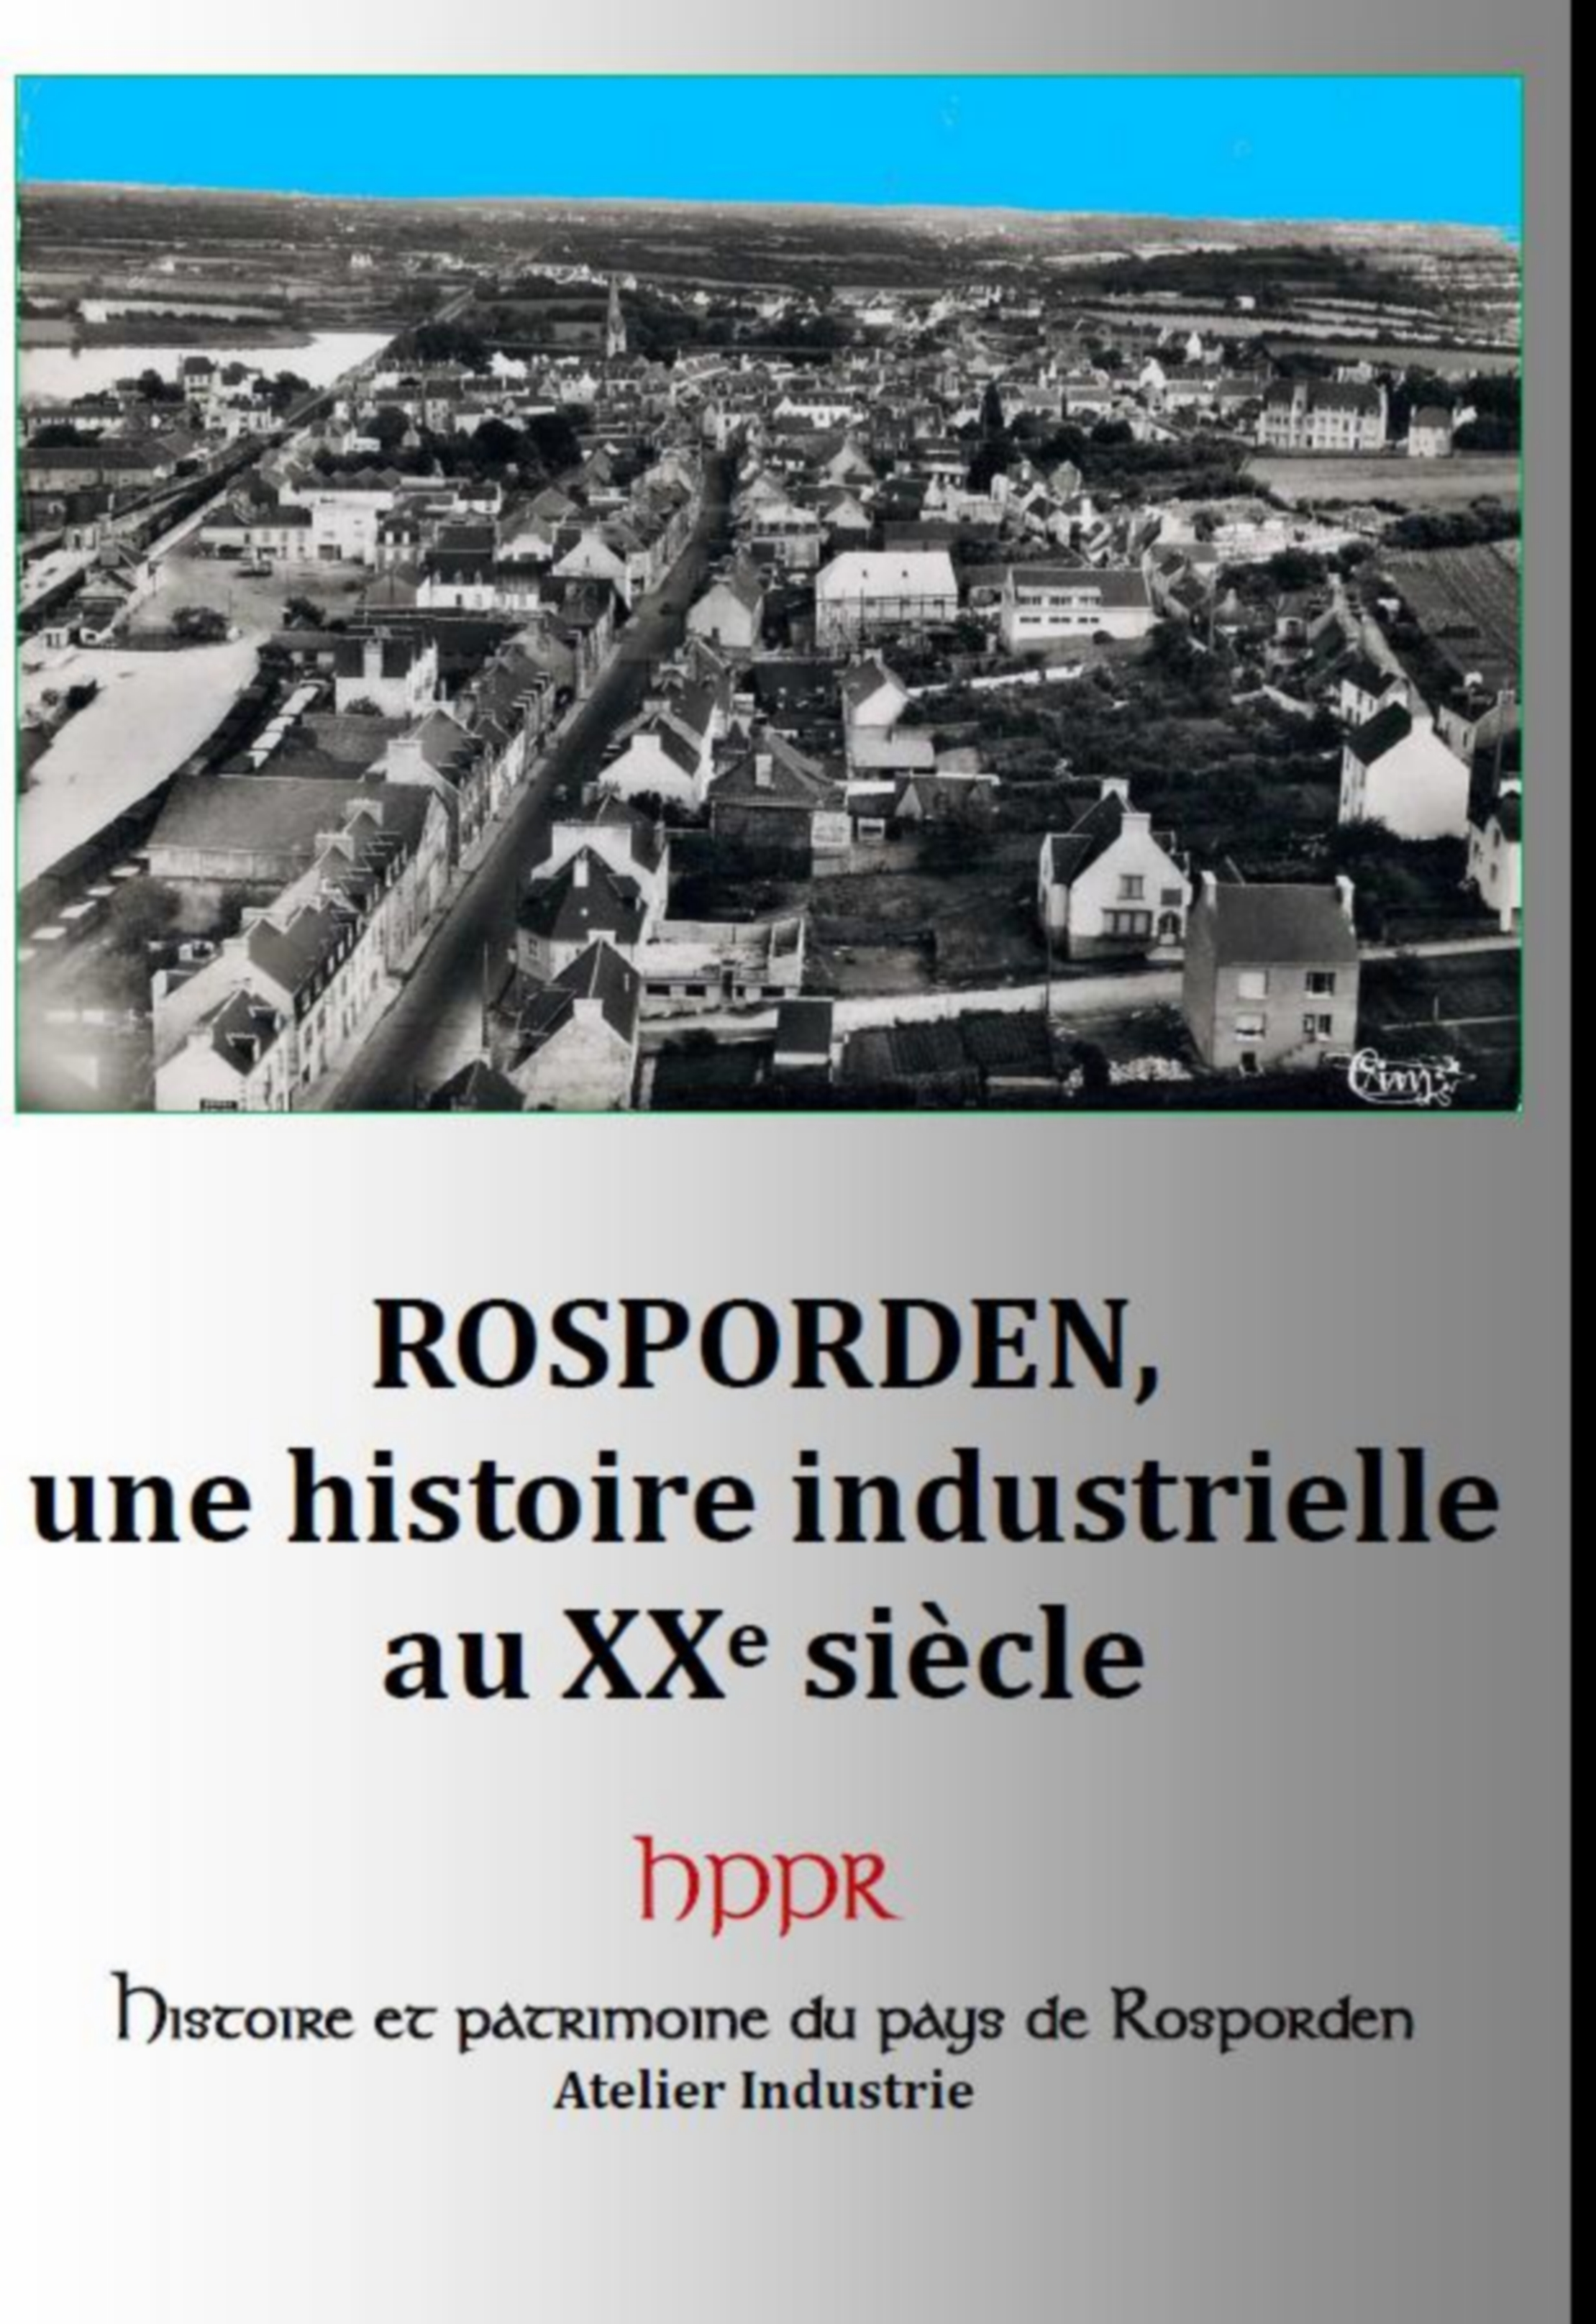 Rosporden : Industrie au XXe siècle